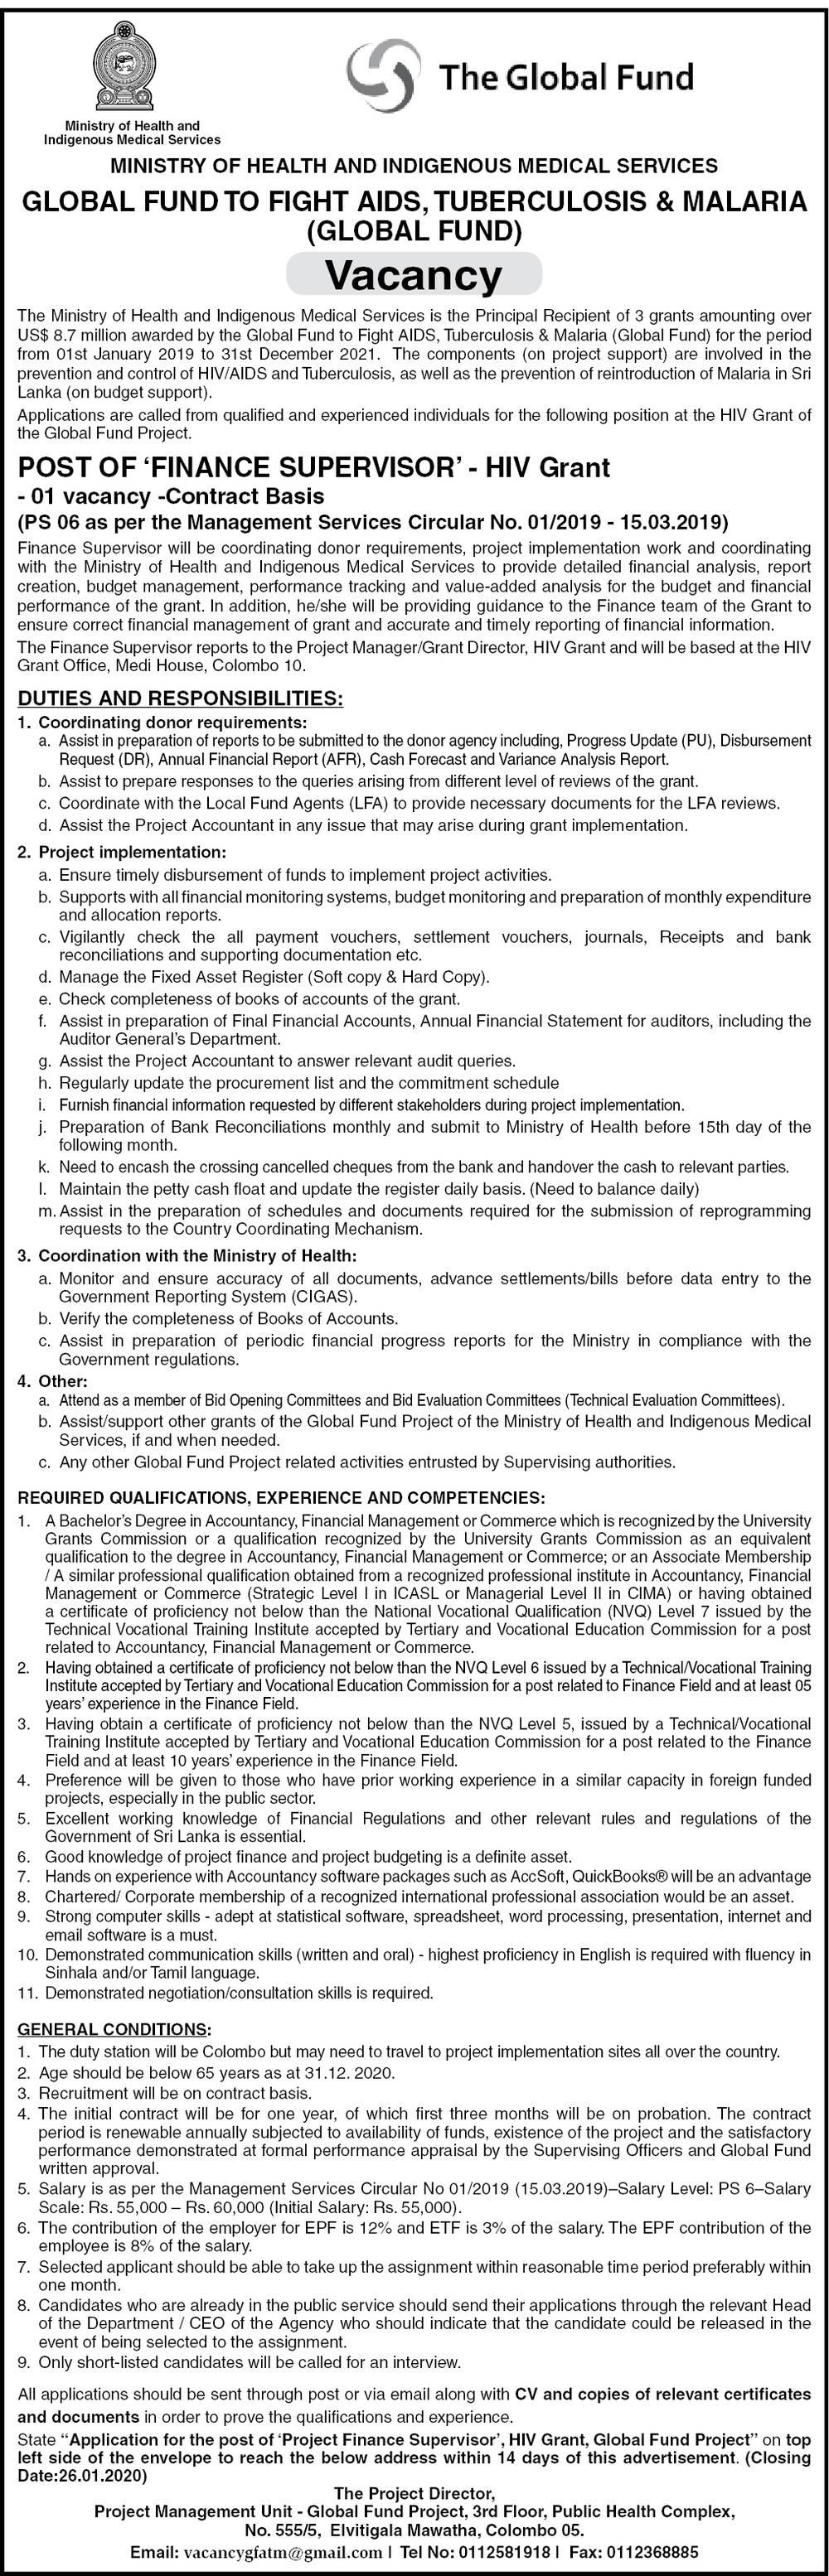 Ministry of Health Job Vacancies 2020